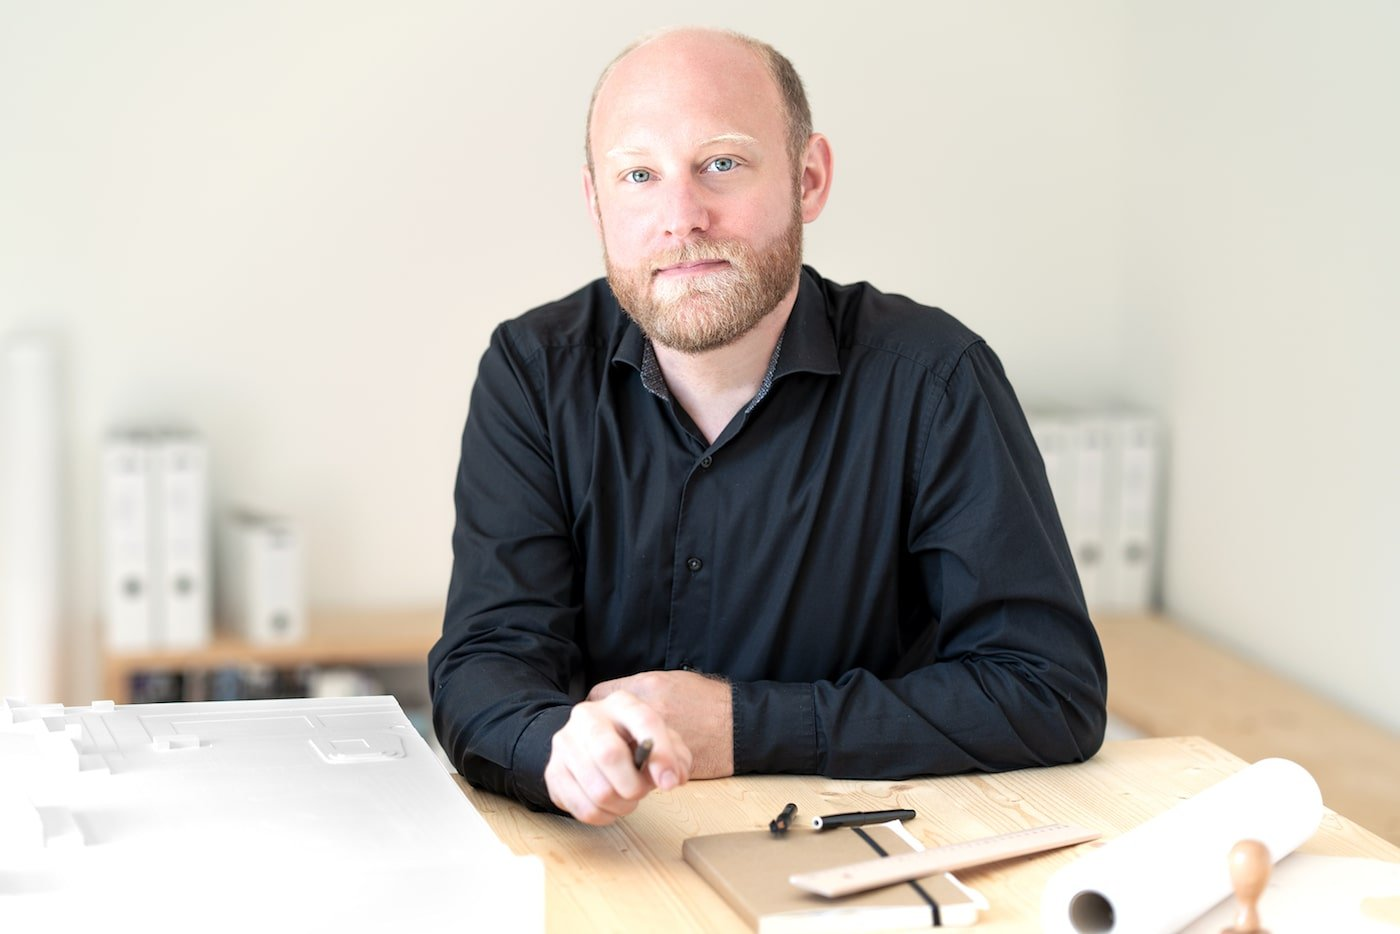 Lukas Maehr sitting at desk